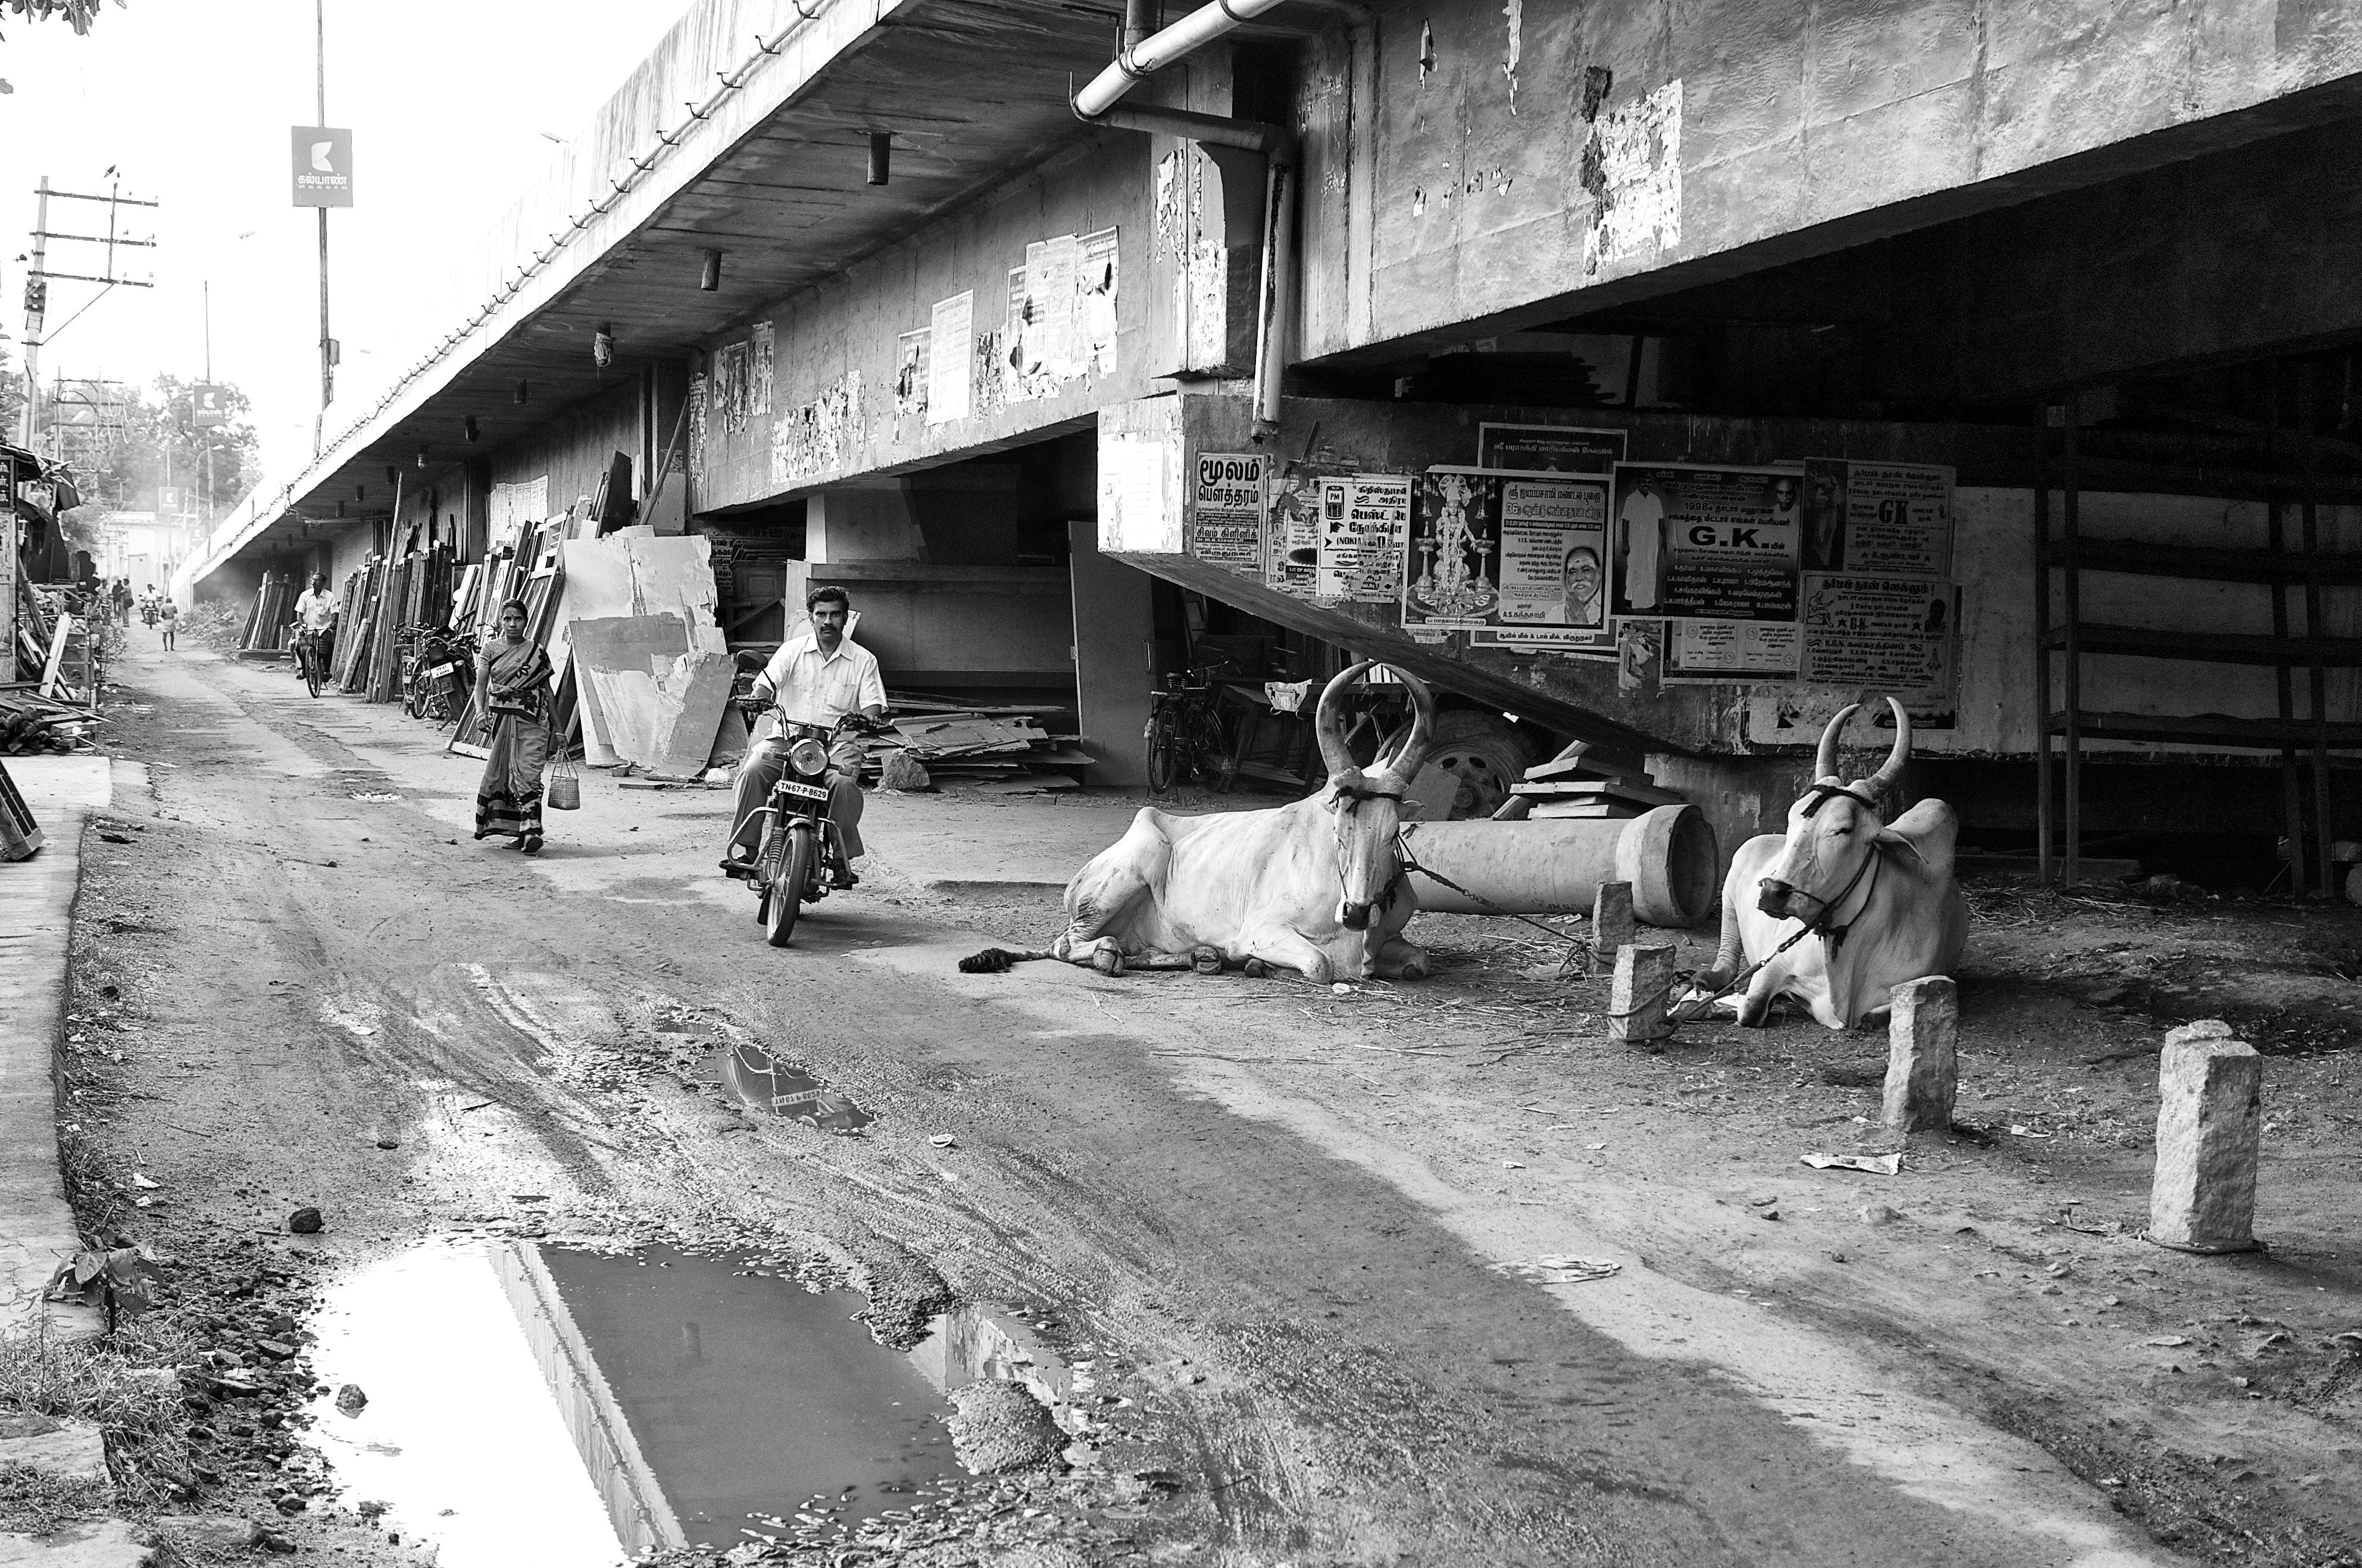 Bulls are resting under the bridge, Virudhunagar, India